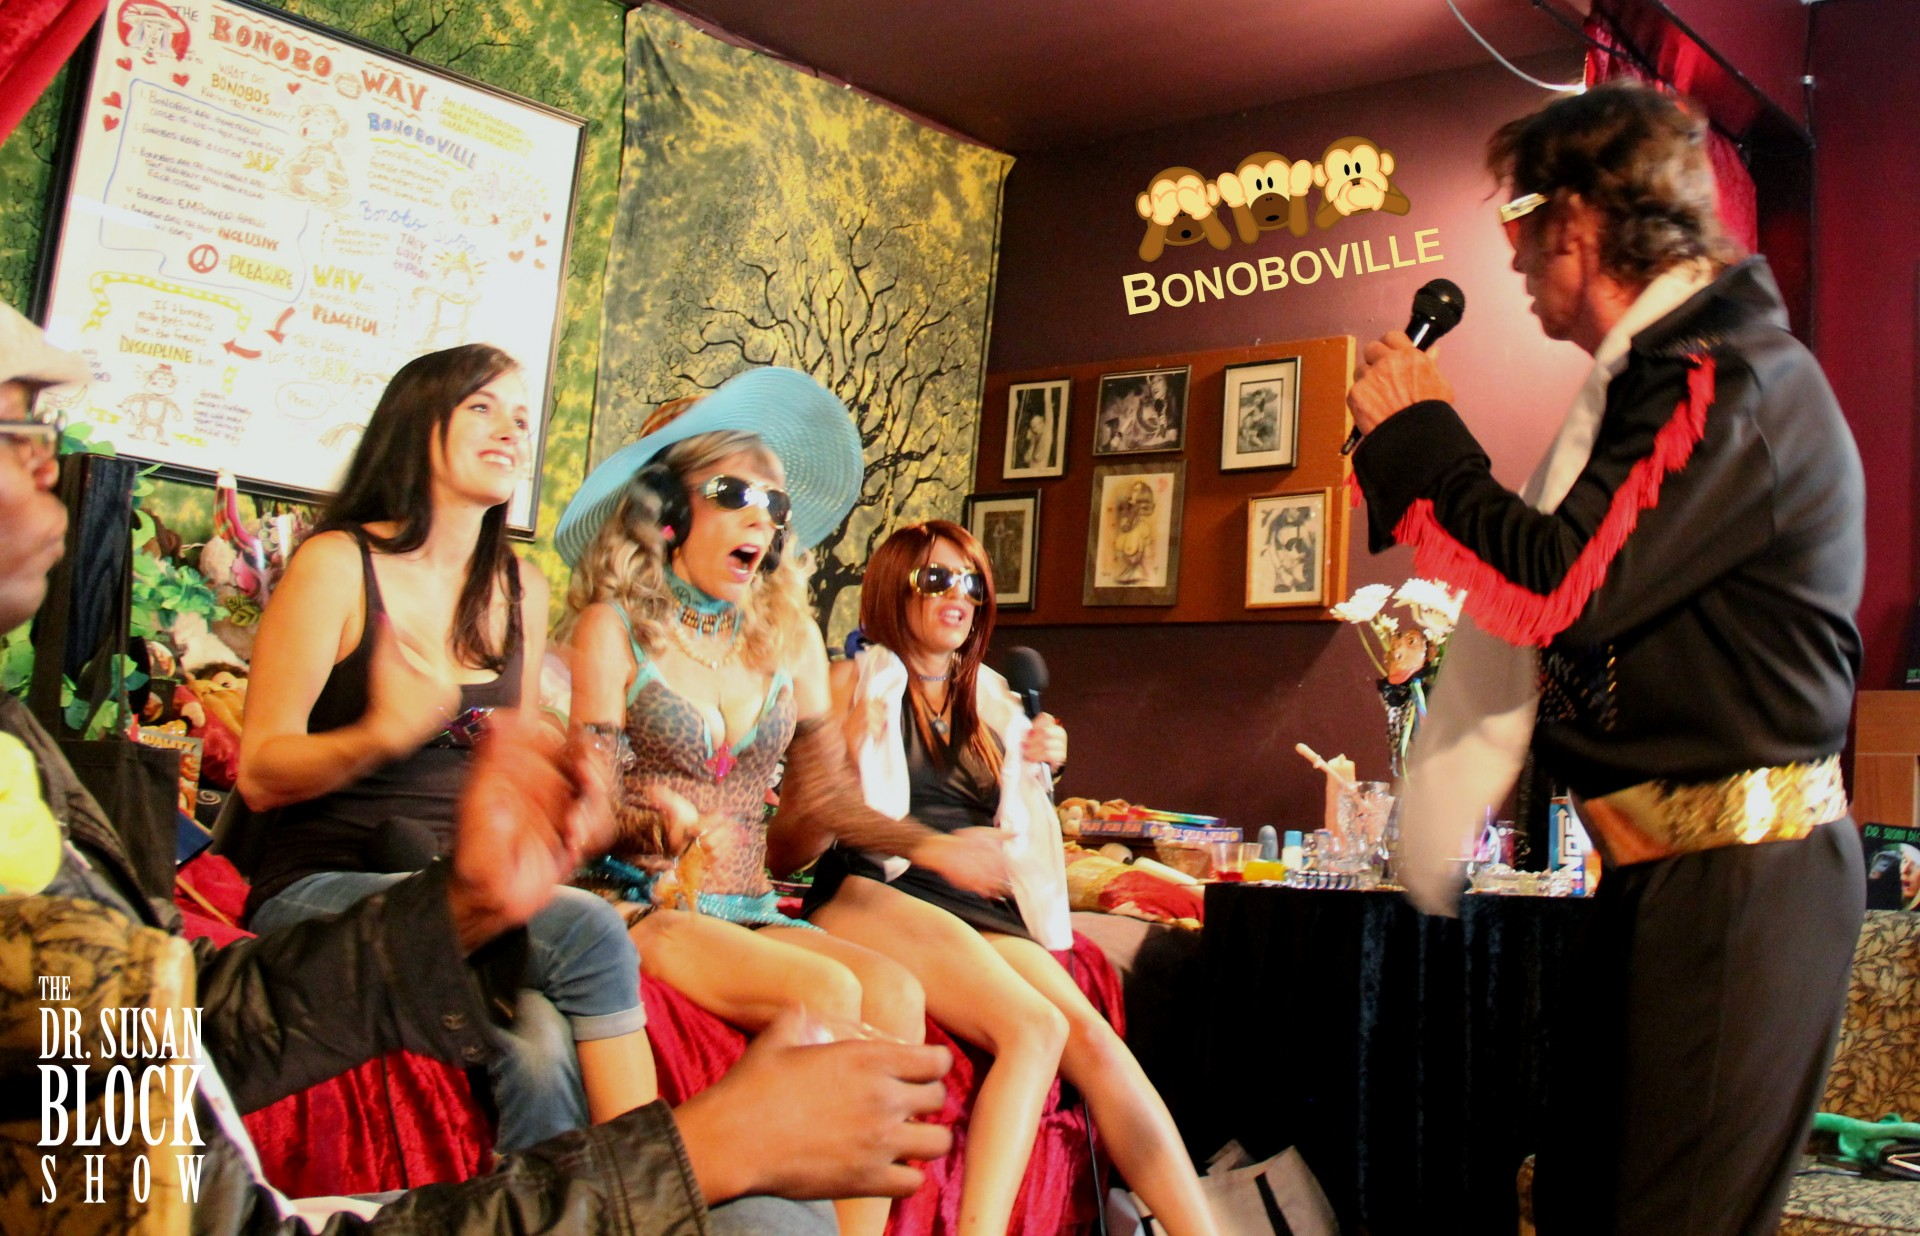 Elvis in Bonoboville with Smokey Binion, Jr channeling Elvis, plus Savannah Fyre, Madam Raven Rae and Daryl Wright LiVE on The Dr. Susan Block Show. Photo: Roberto Bonobo